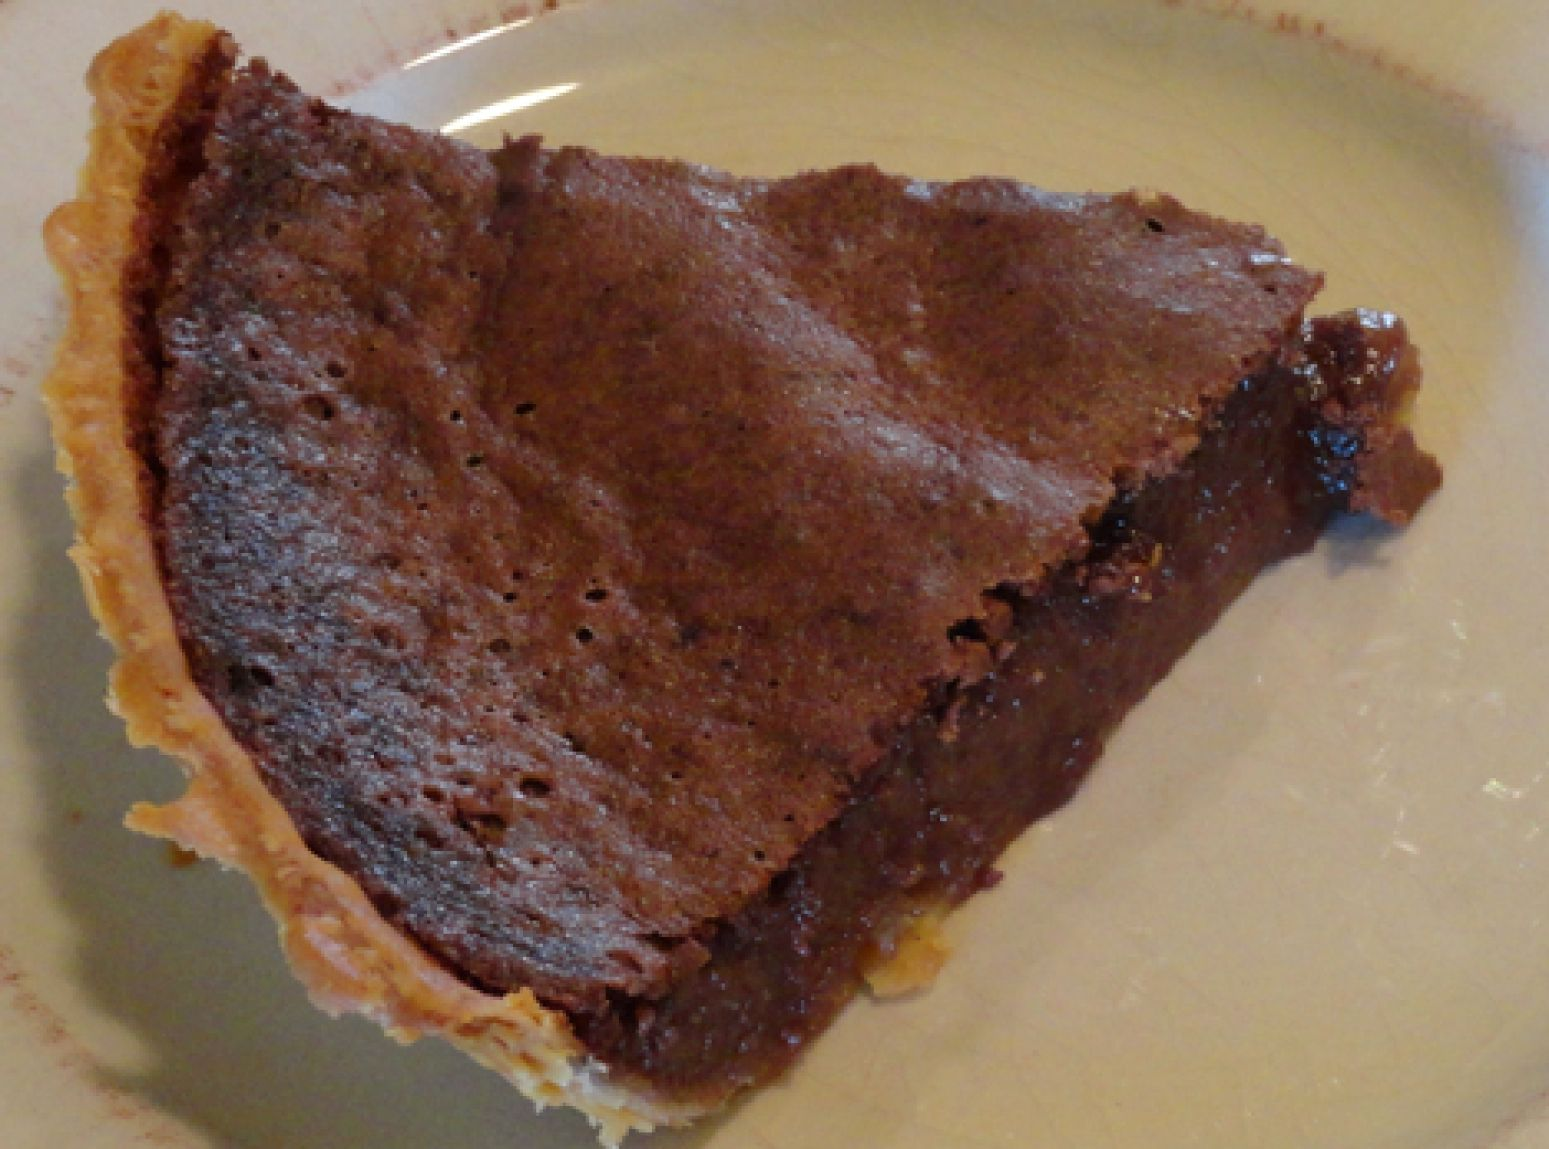 Chocolate Buttermilk Pie Recipe Just A Pinch Recipes Desserts Chocolate Buttermilk Pie Recipe Buttermilk Pie